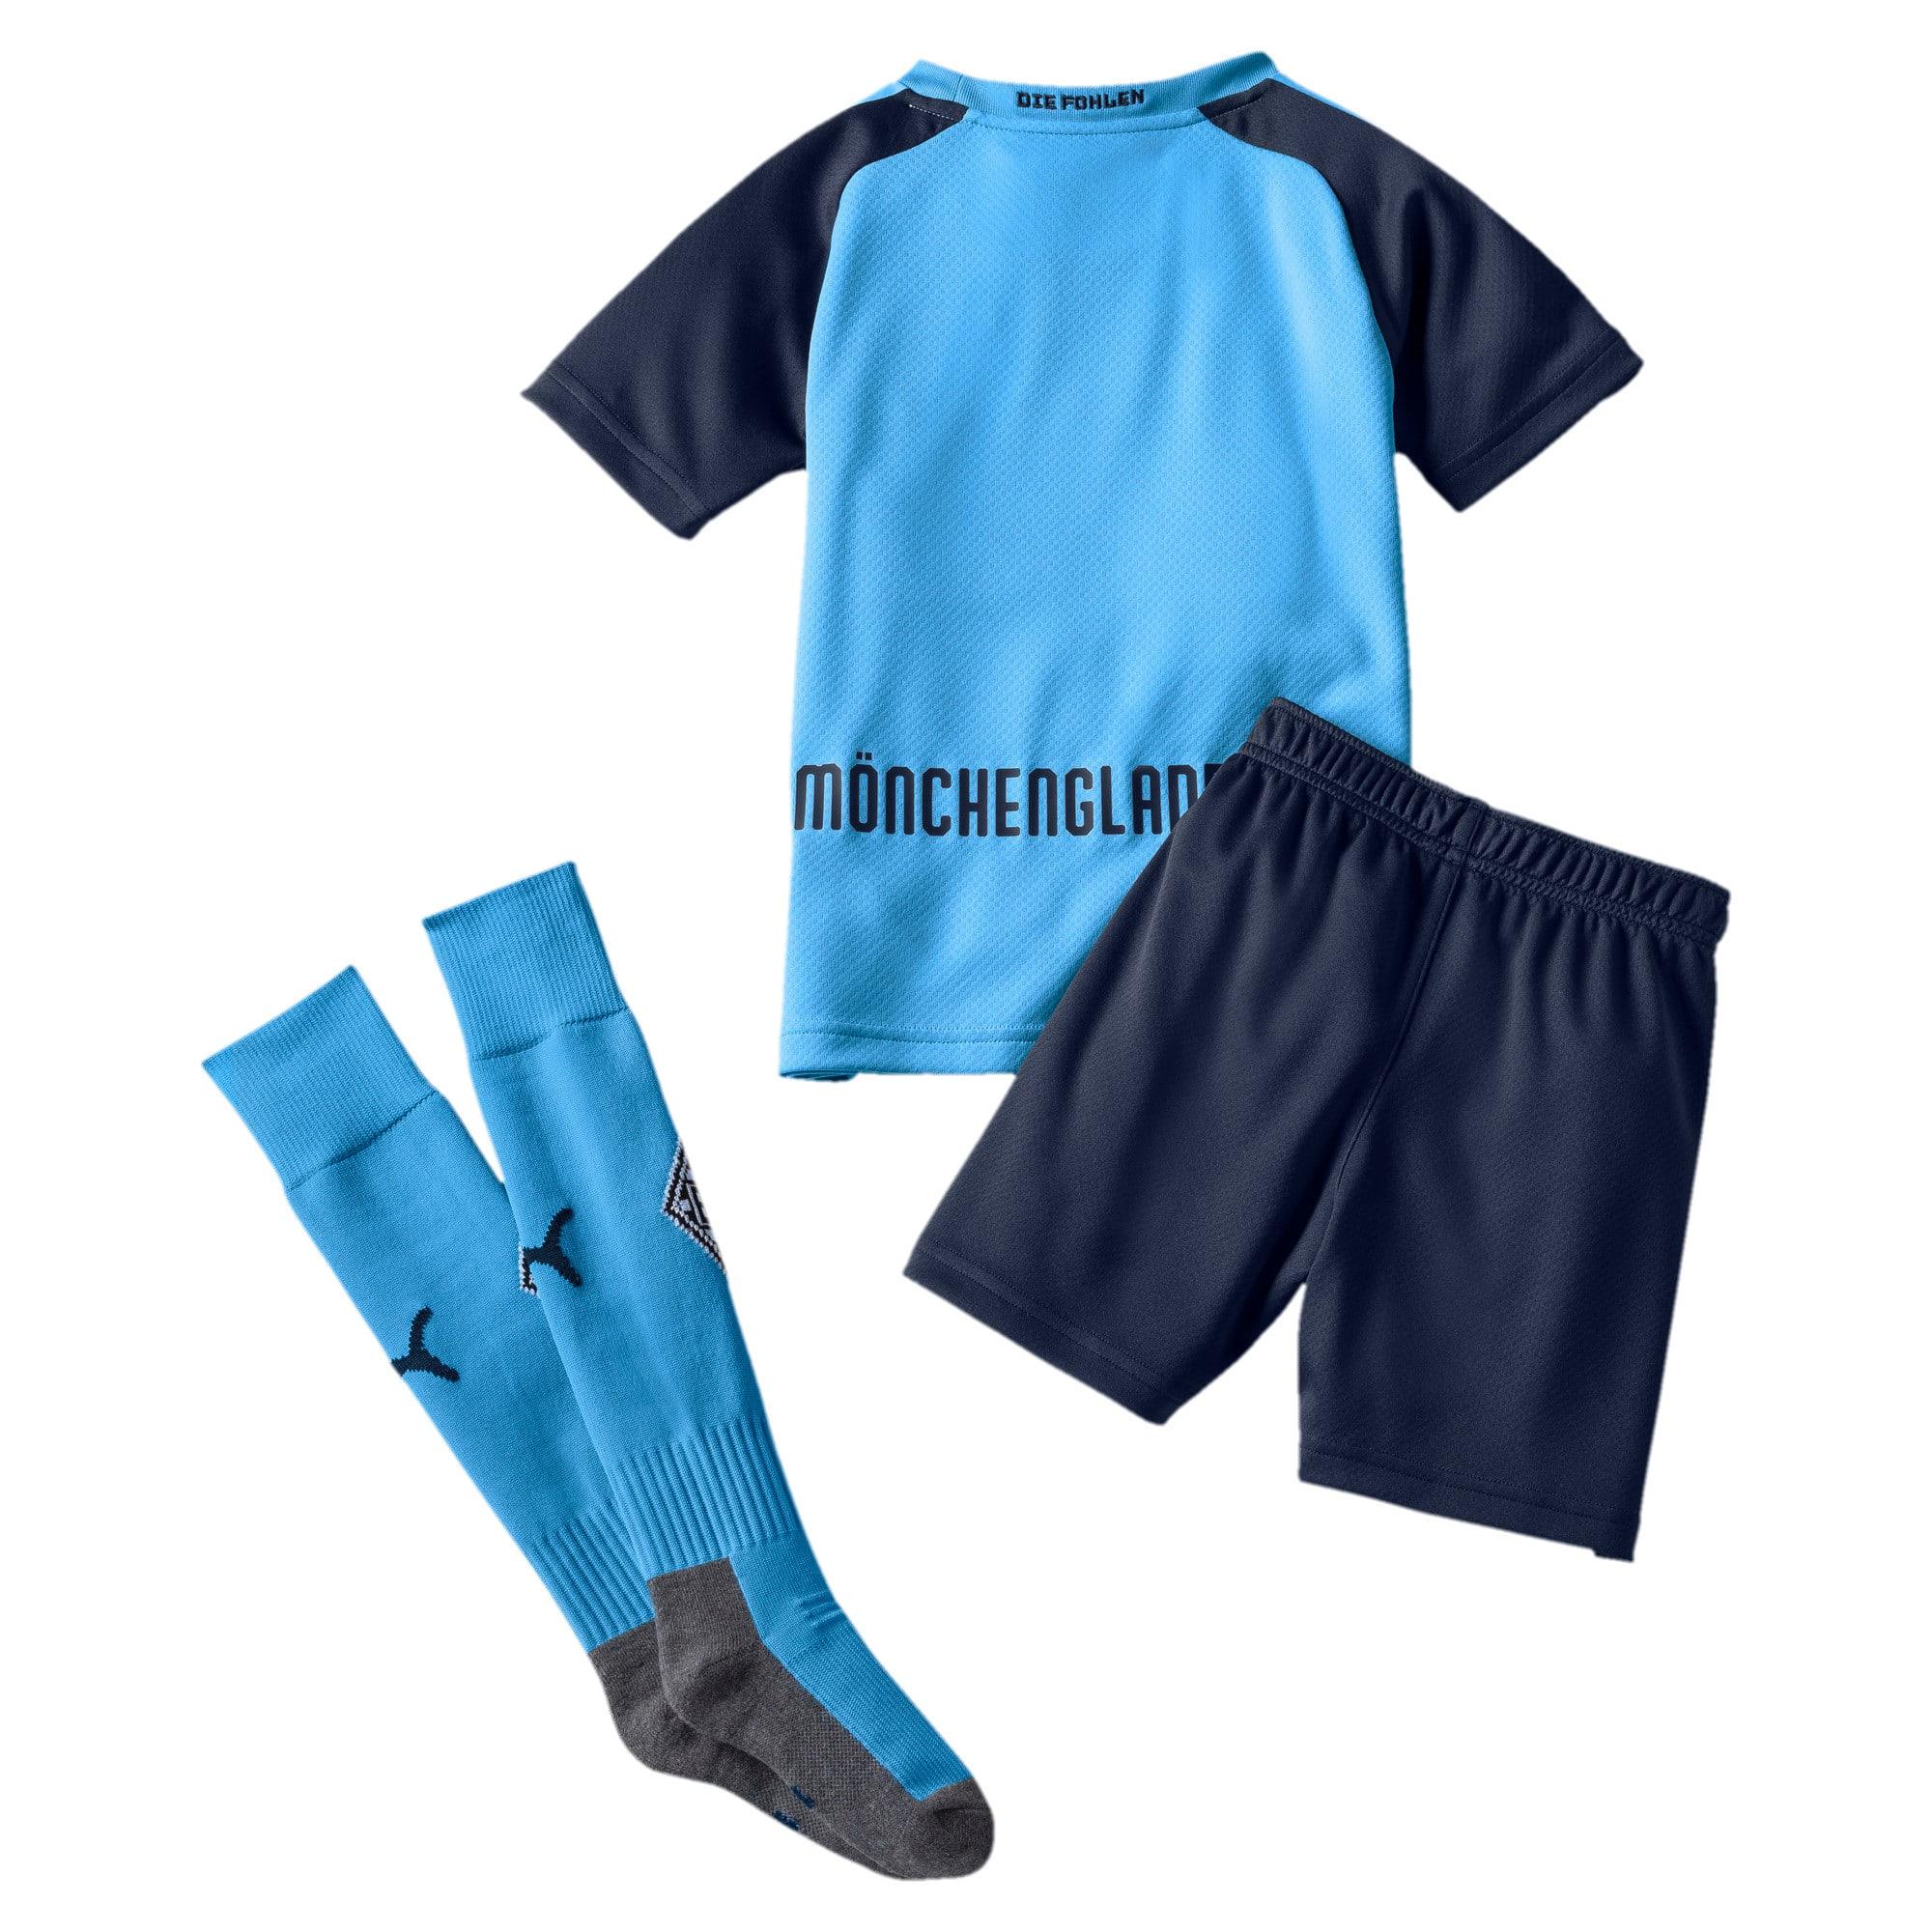 Thumbnail 2 of Borussia Mönchengladbach Away Kids' Mini Kit, Team Light Blue-Peacoat, medium